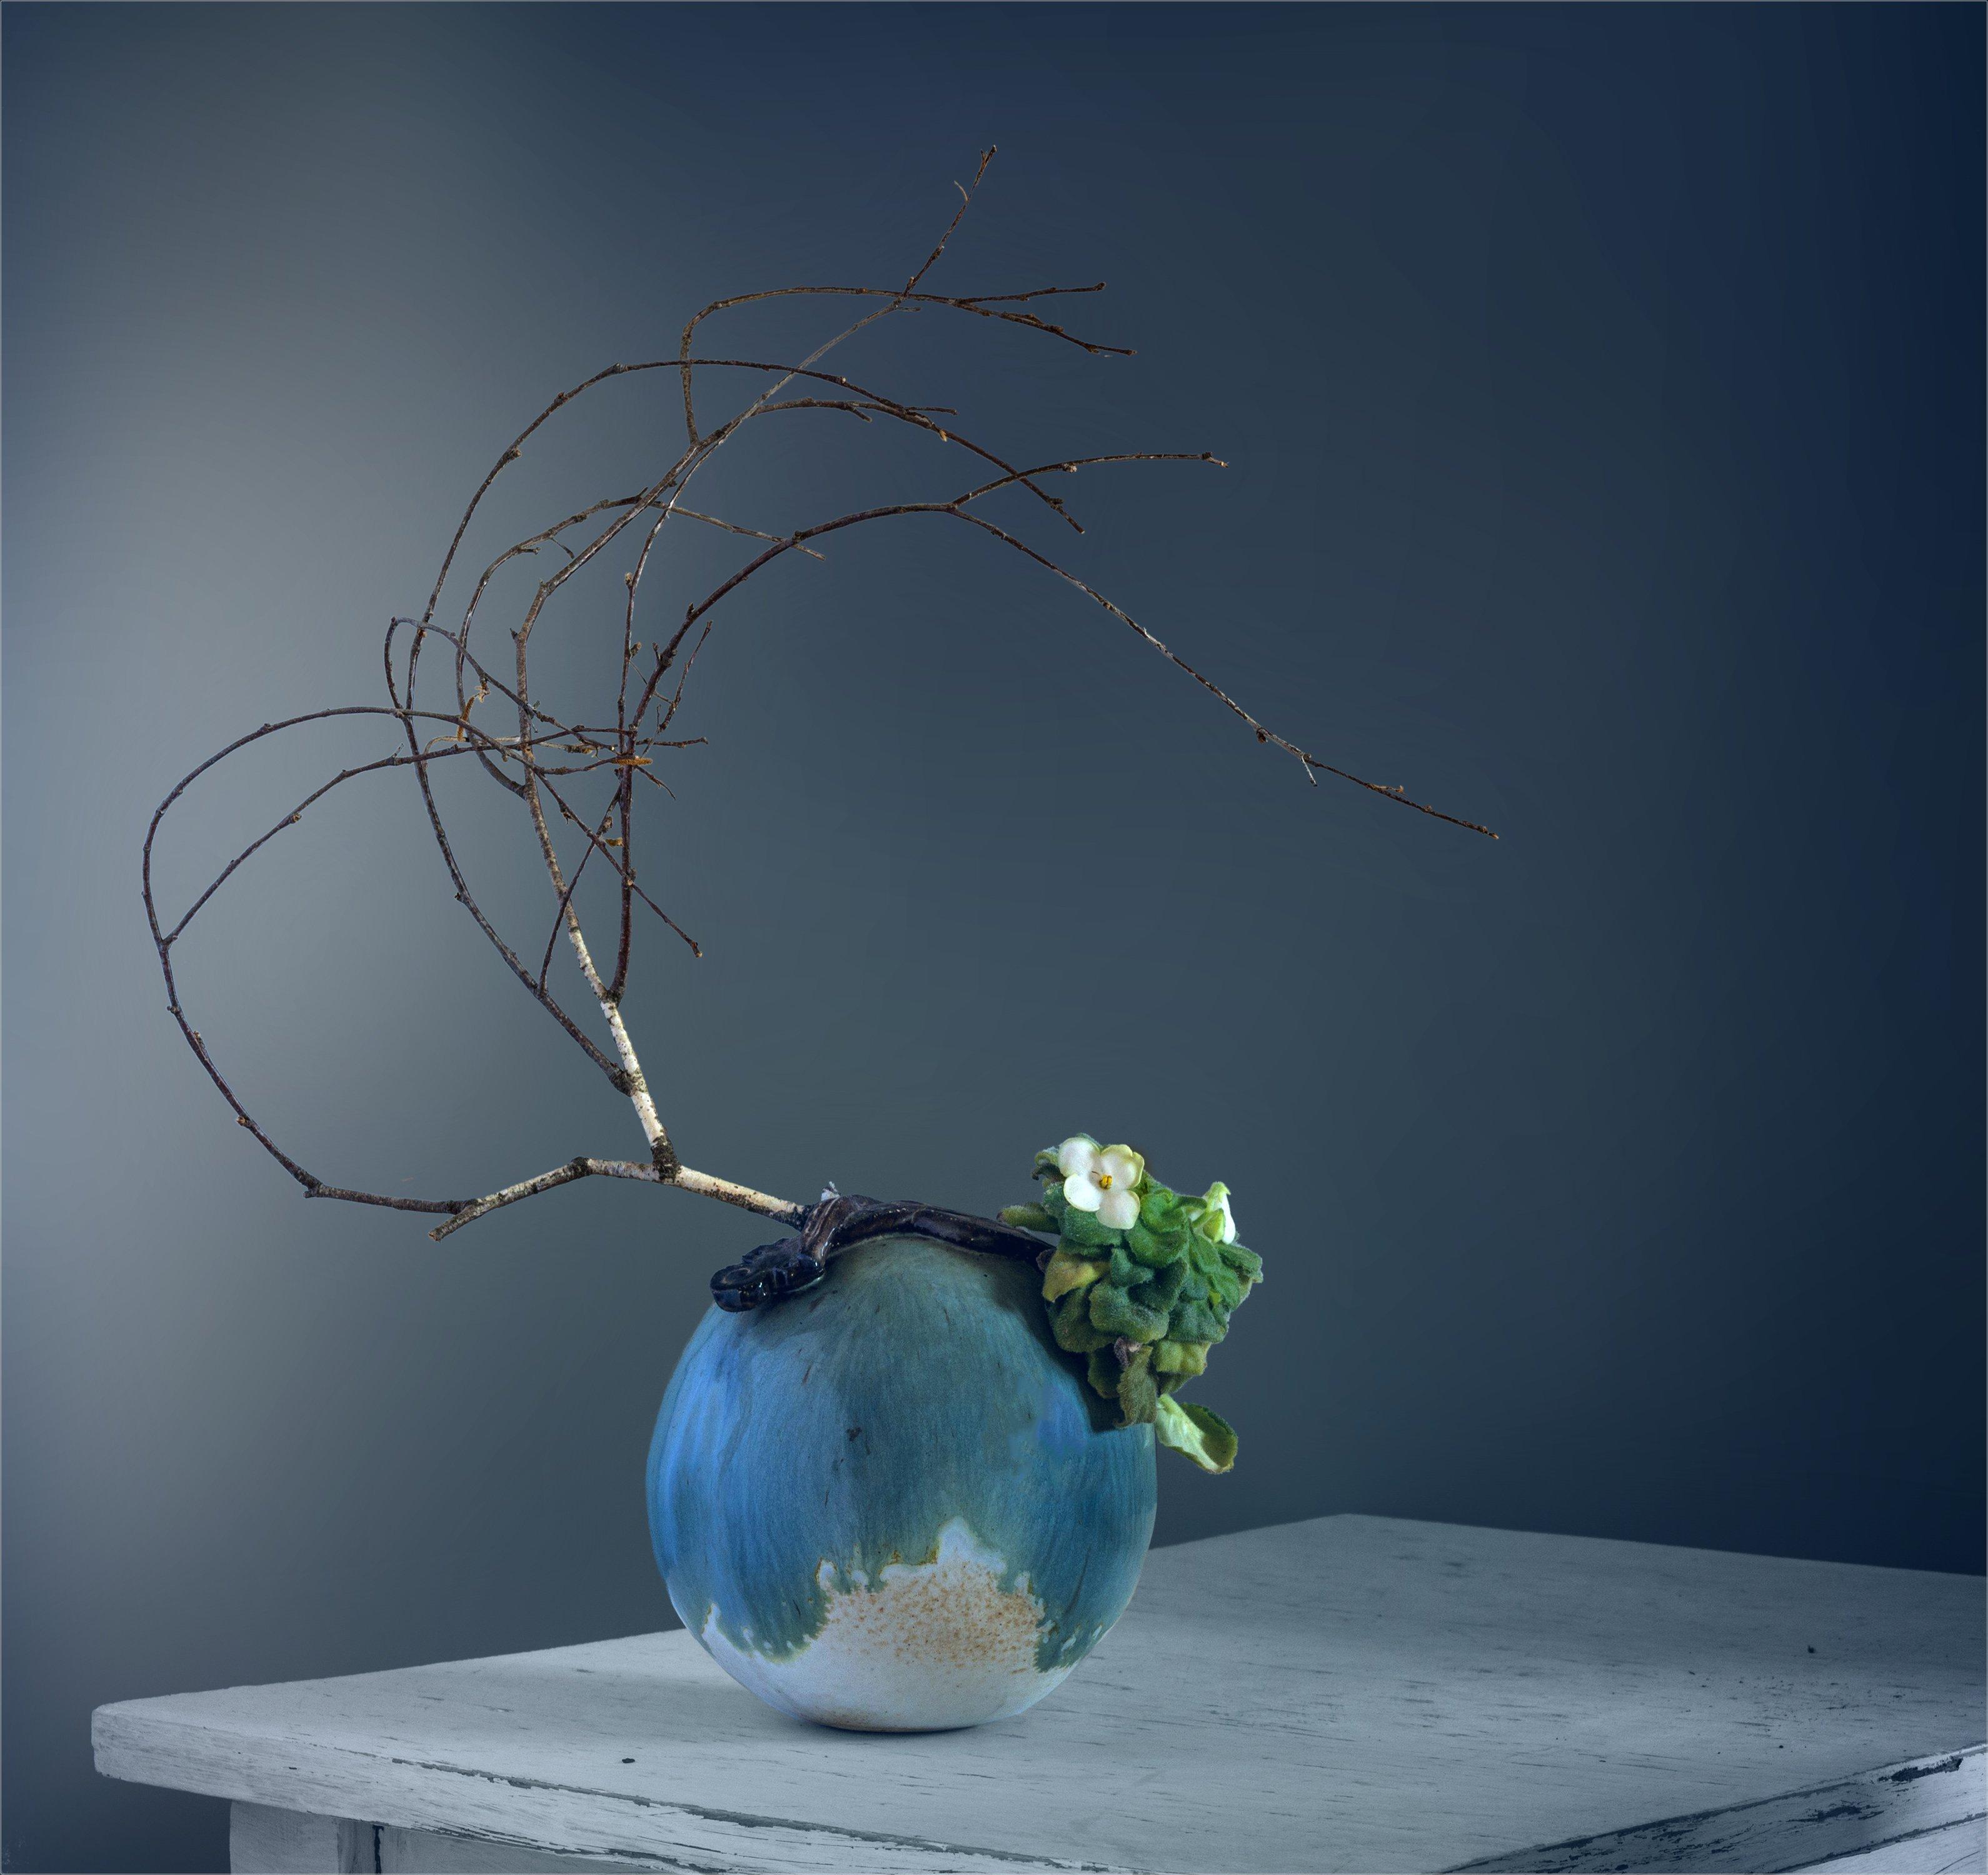 still life, натюрморт,    растение, природа,  винтаж, ретро,  минимализм, ветка, береза, цветы, фиалки,, Михаил MSH